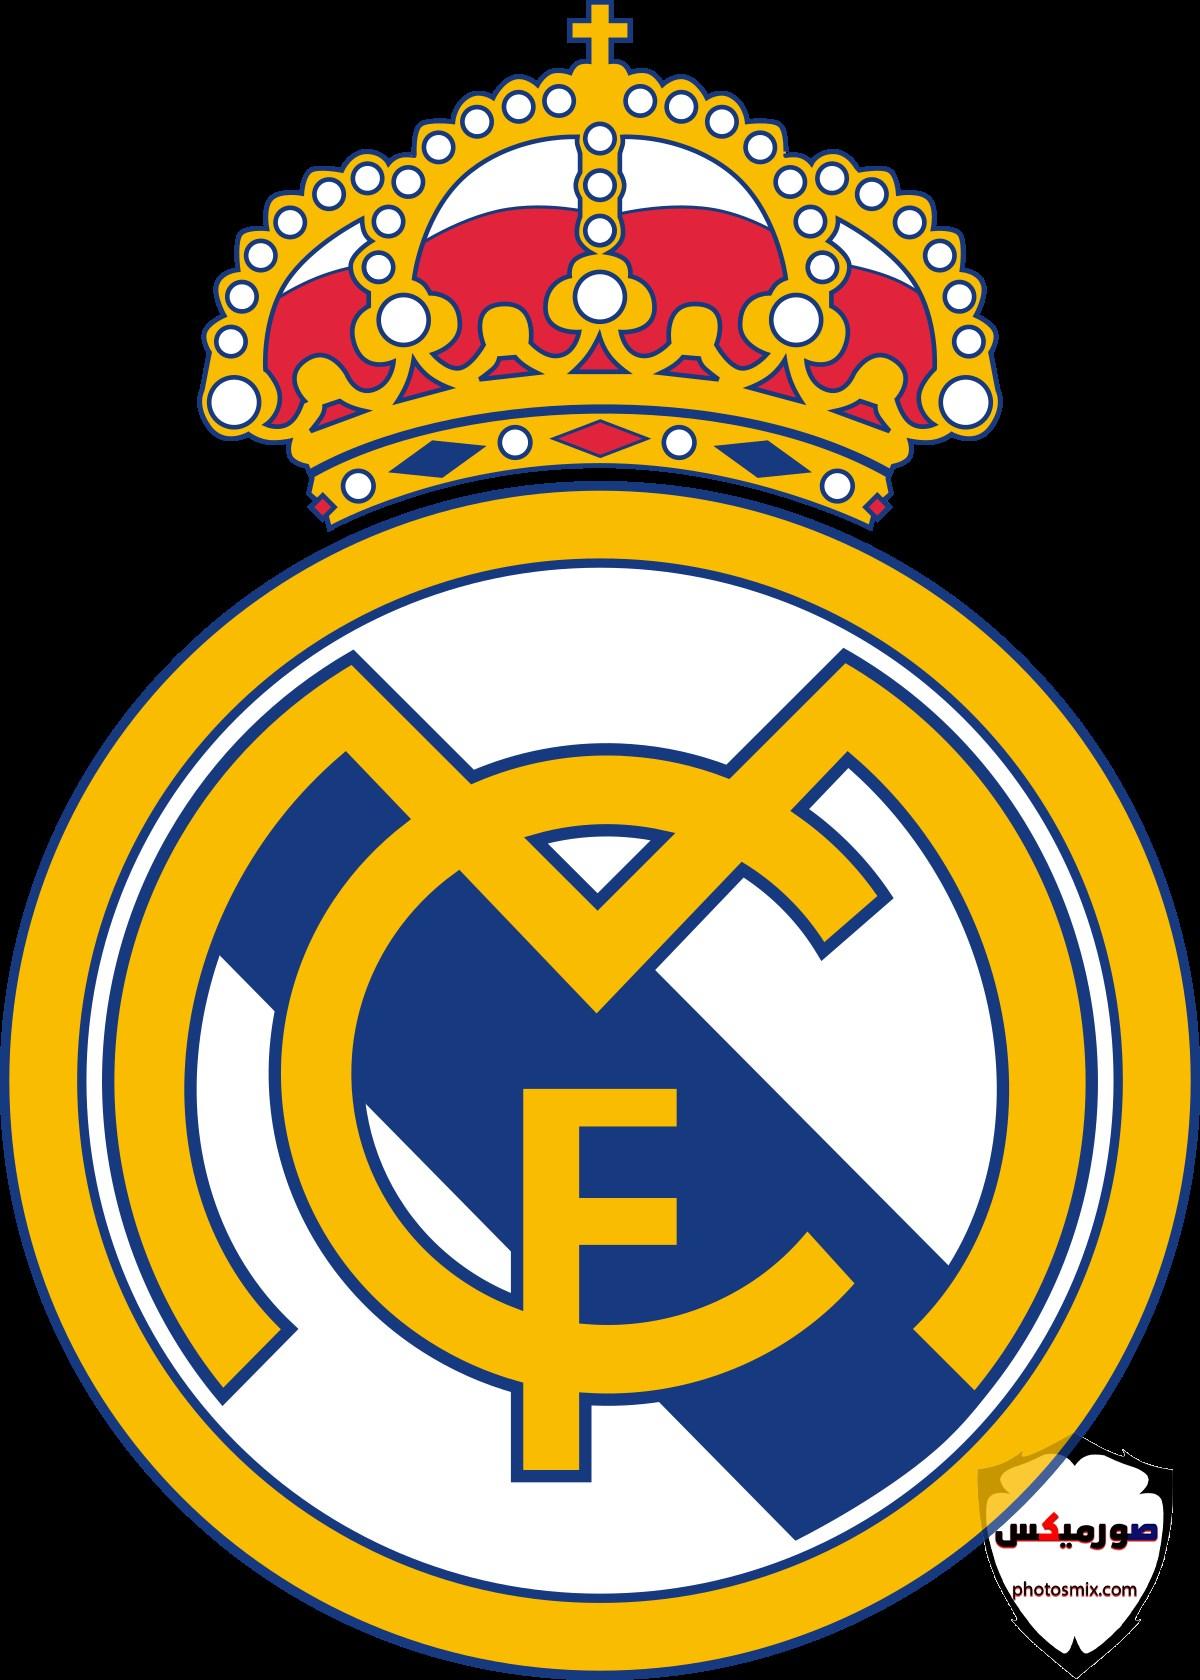 صور ريال مدريد 2020خلفيات ورمزيات ريال مدريد صور لاعبي ريال مدريد real madrid 3 1